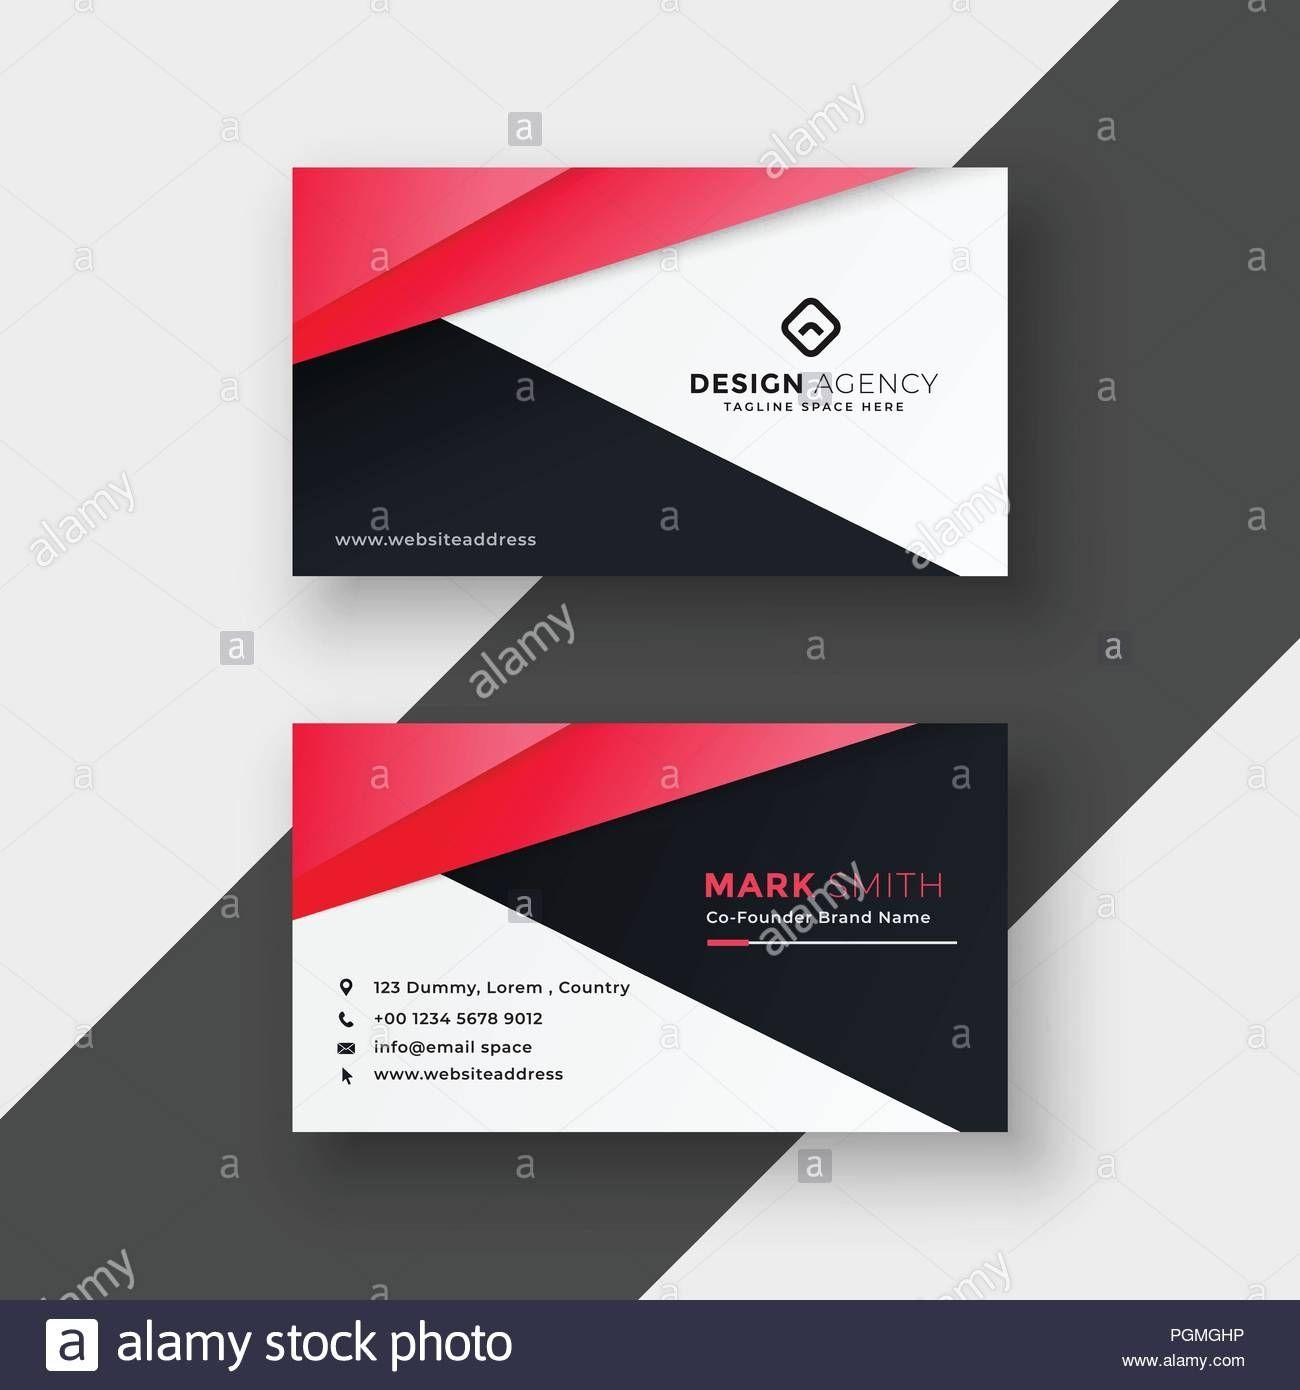 Business Card Background Design Printable Business Card Template Design Visiting Card Design Free Business Card Templates